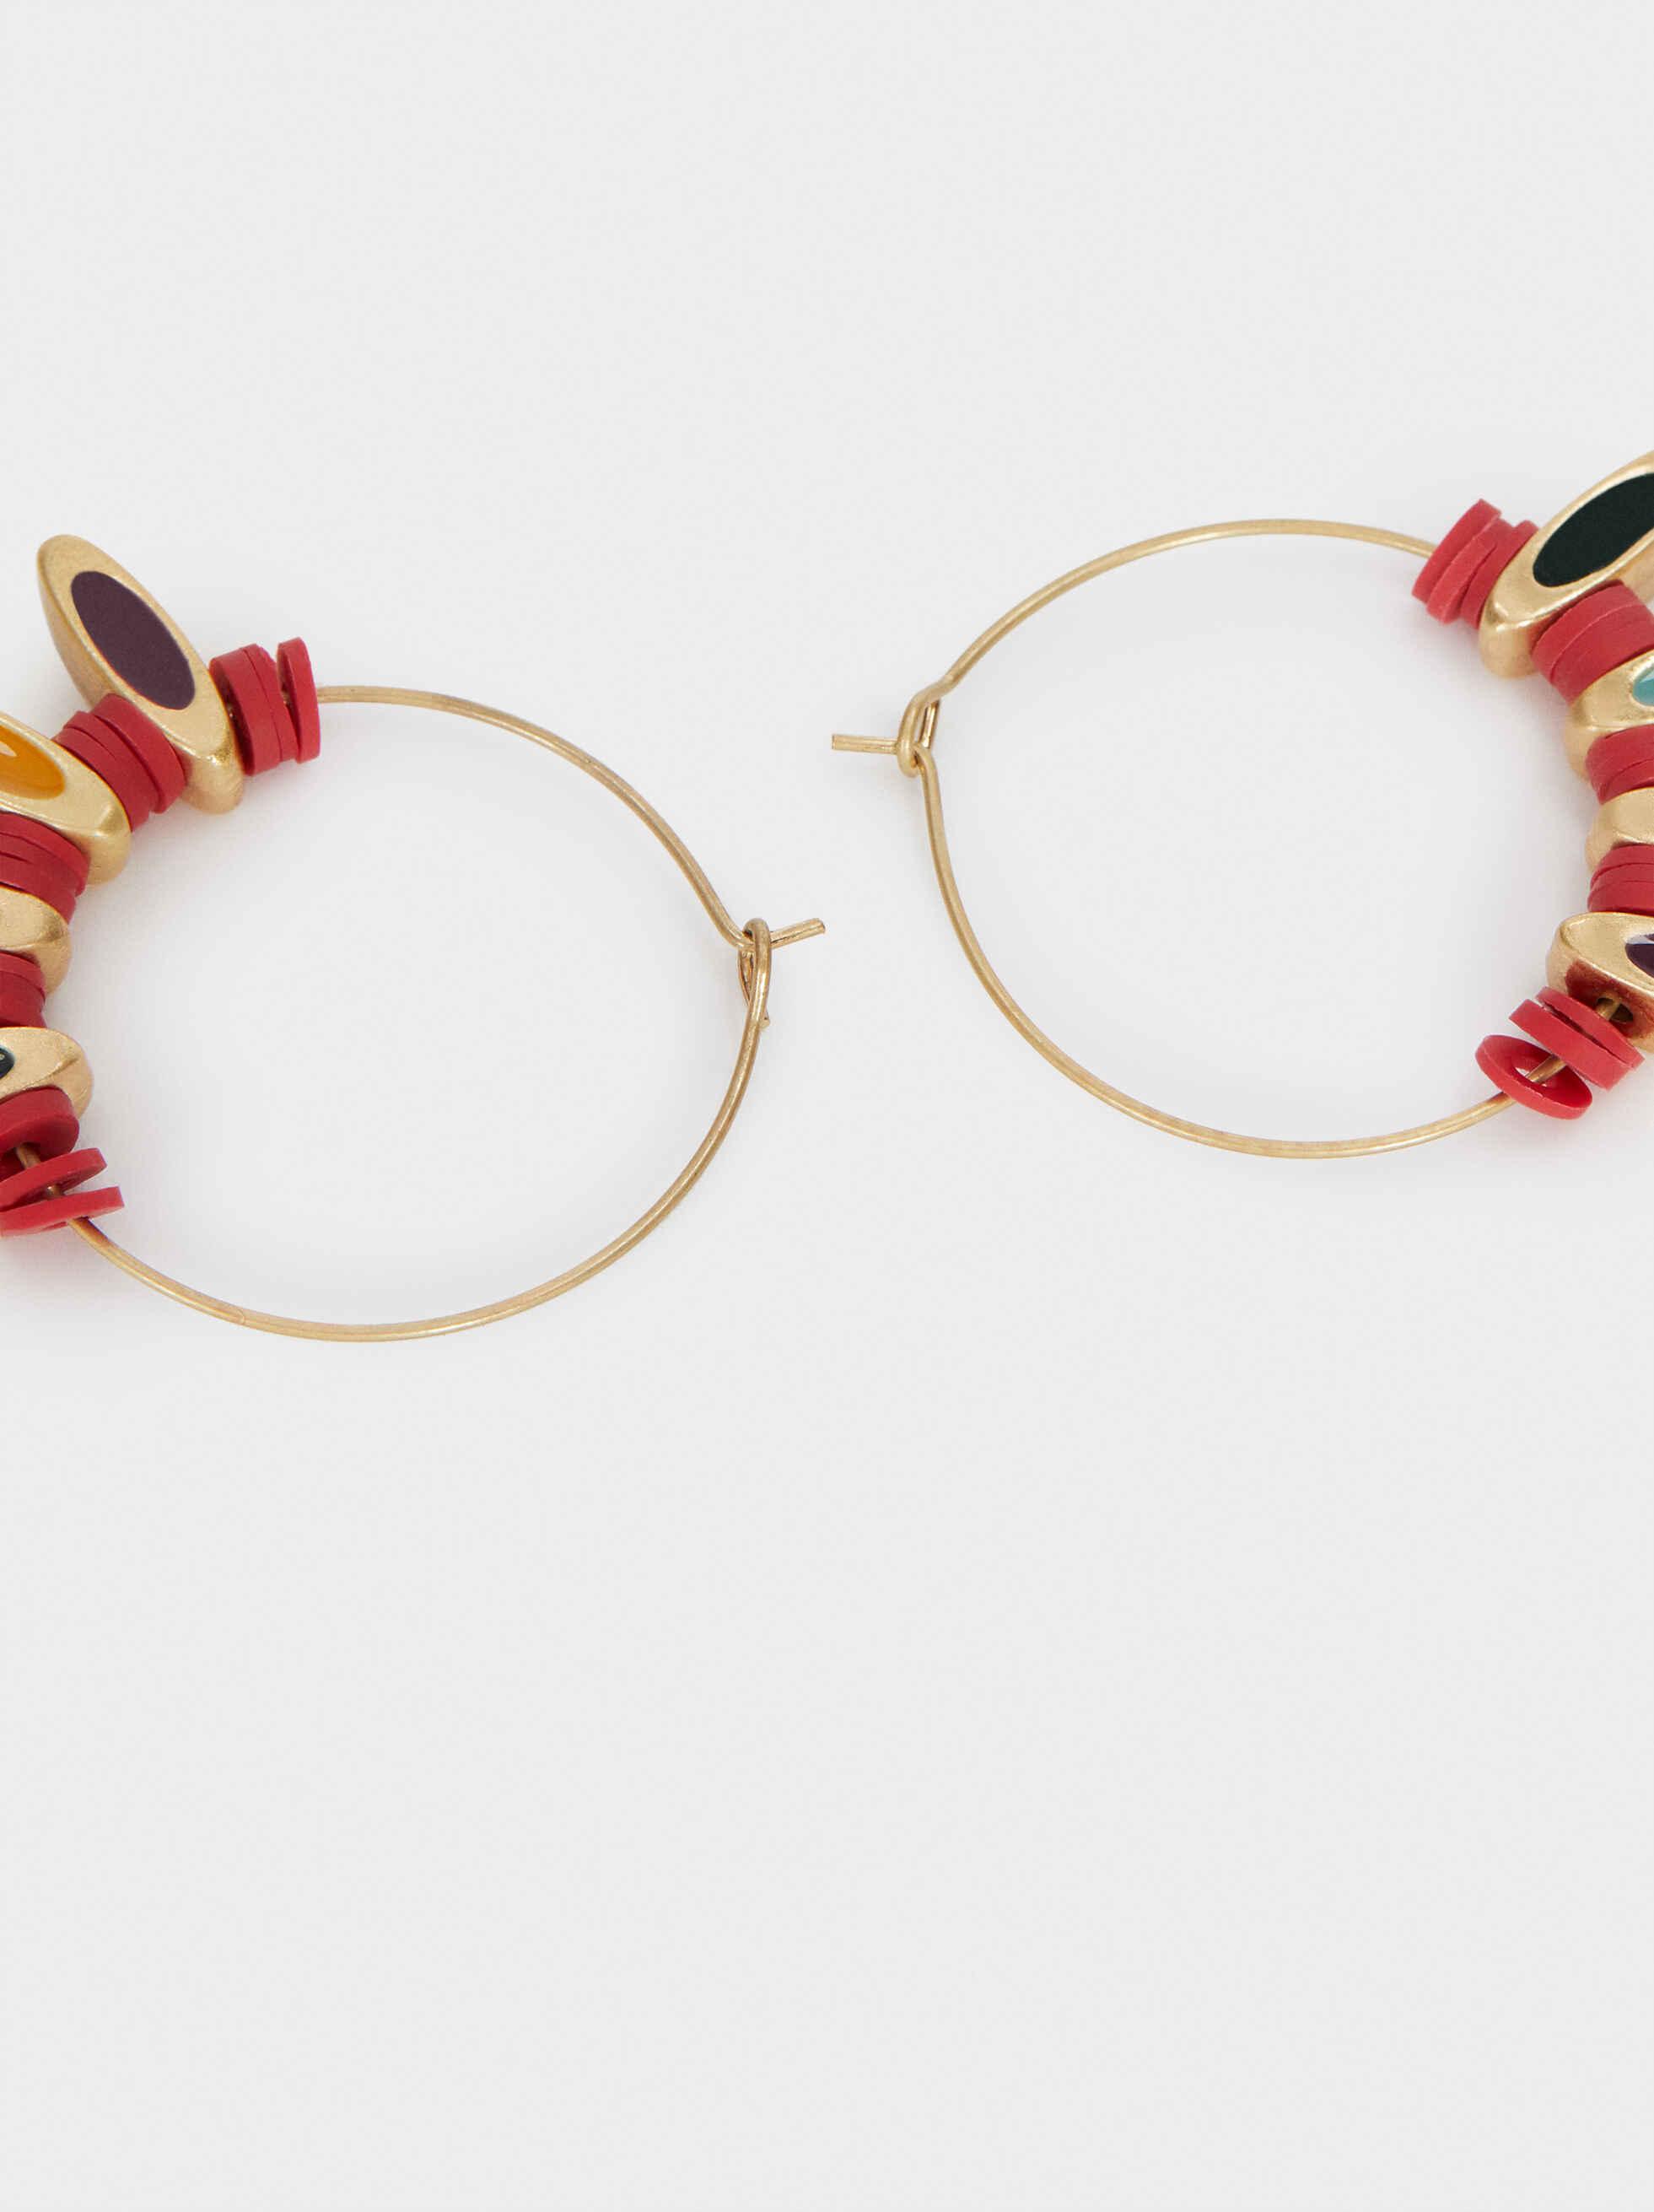 Medium Multicoloured Earrings, Multicolor, hi-res